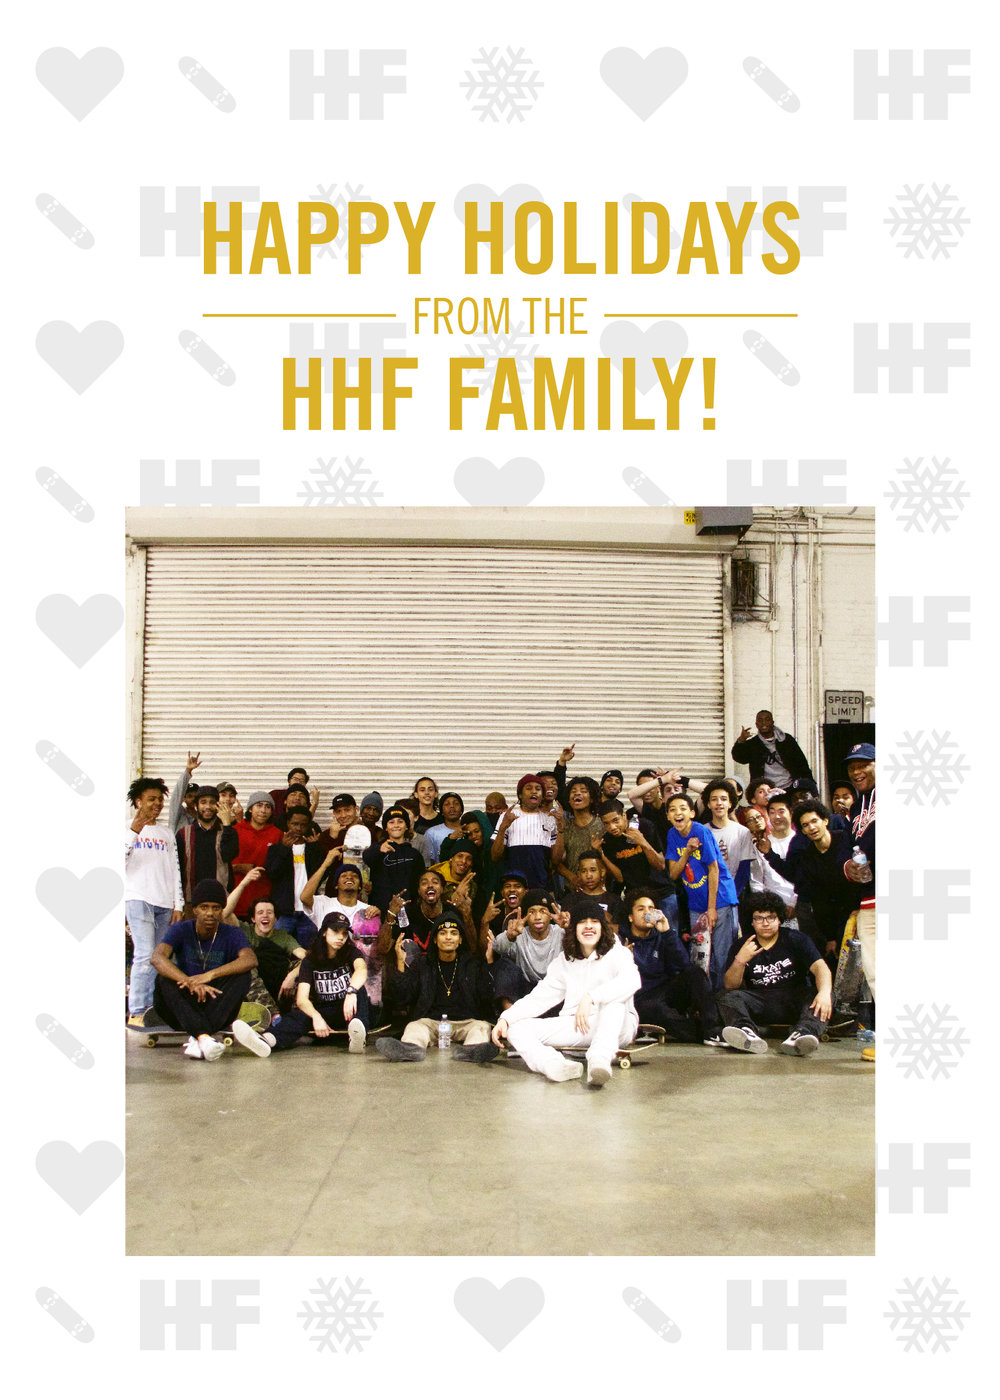 HHF holiday-07.jpg